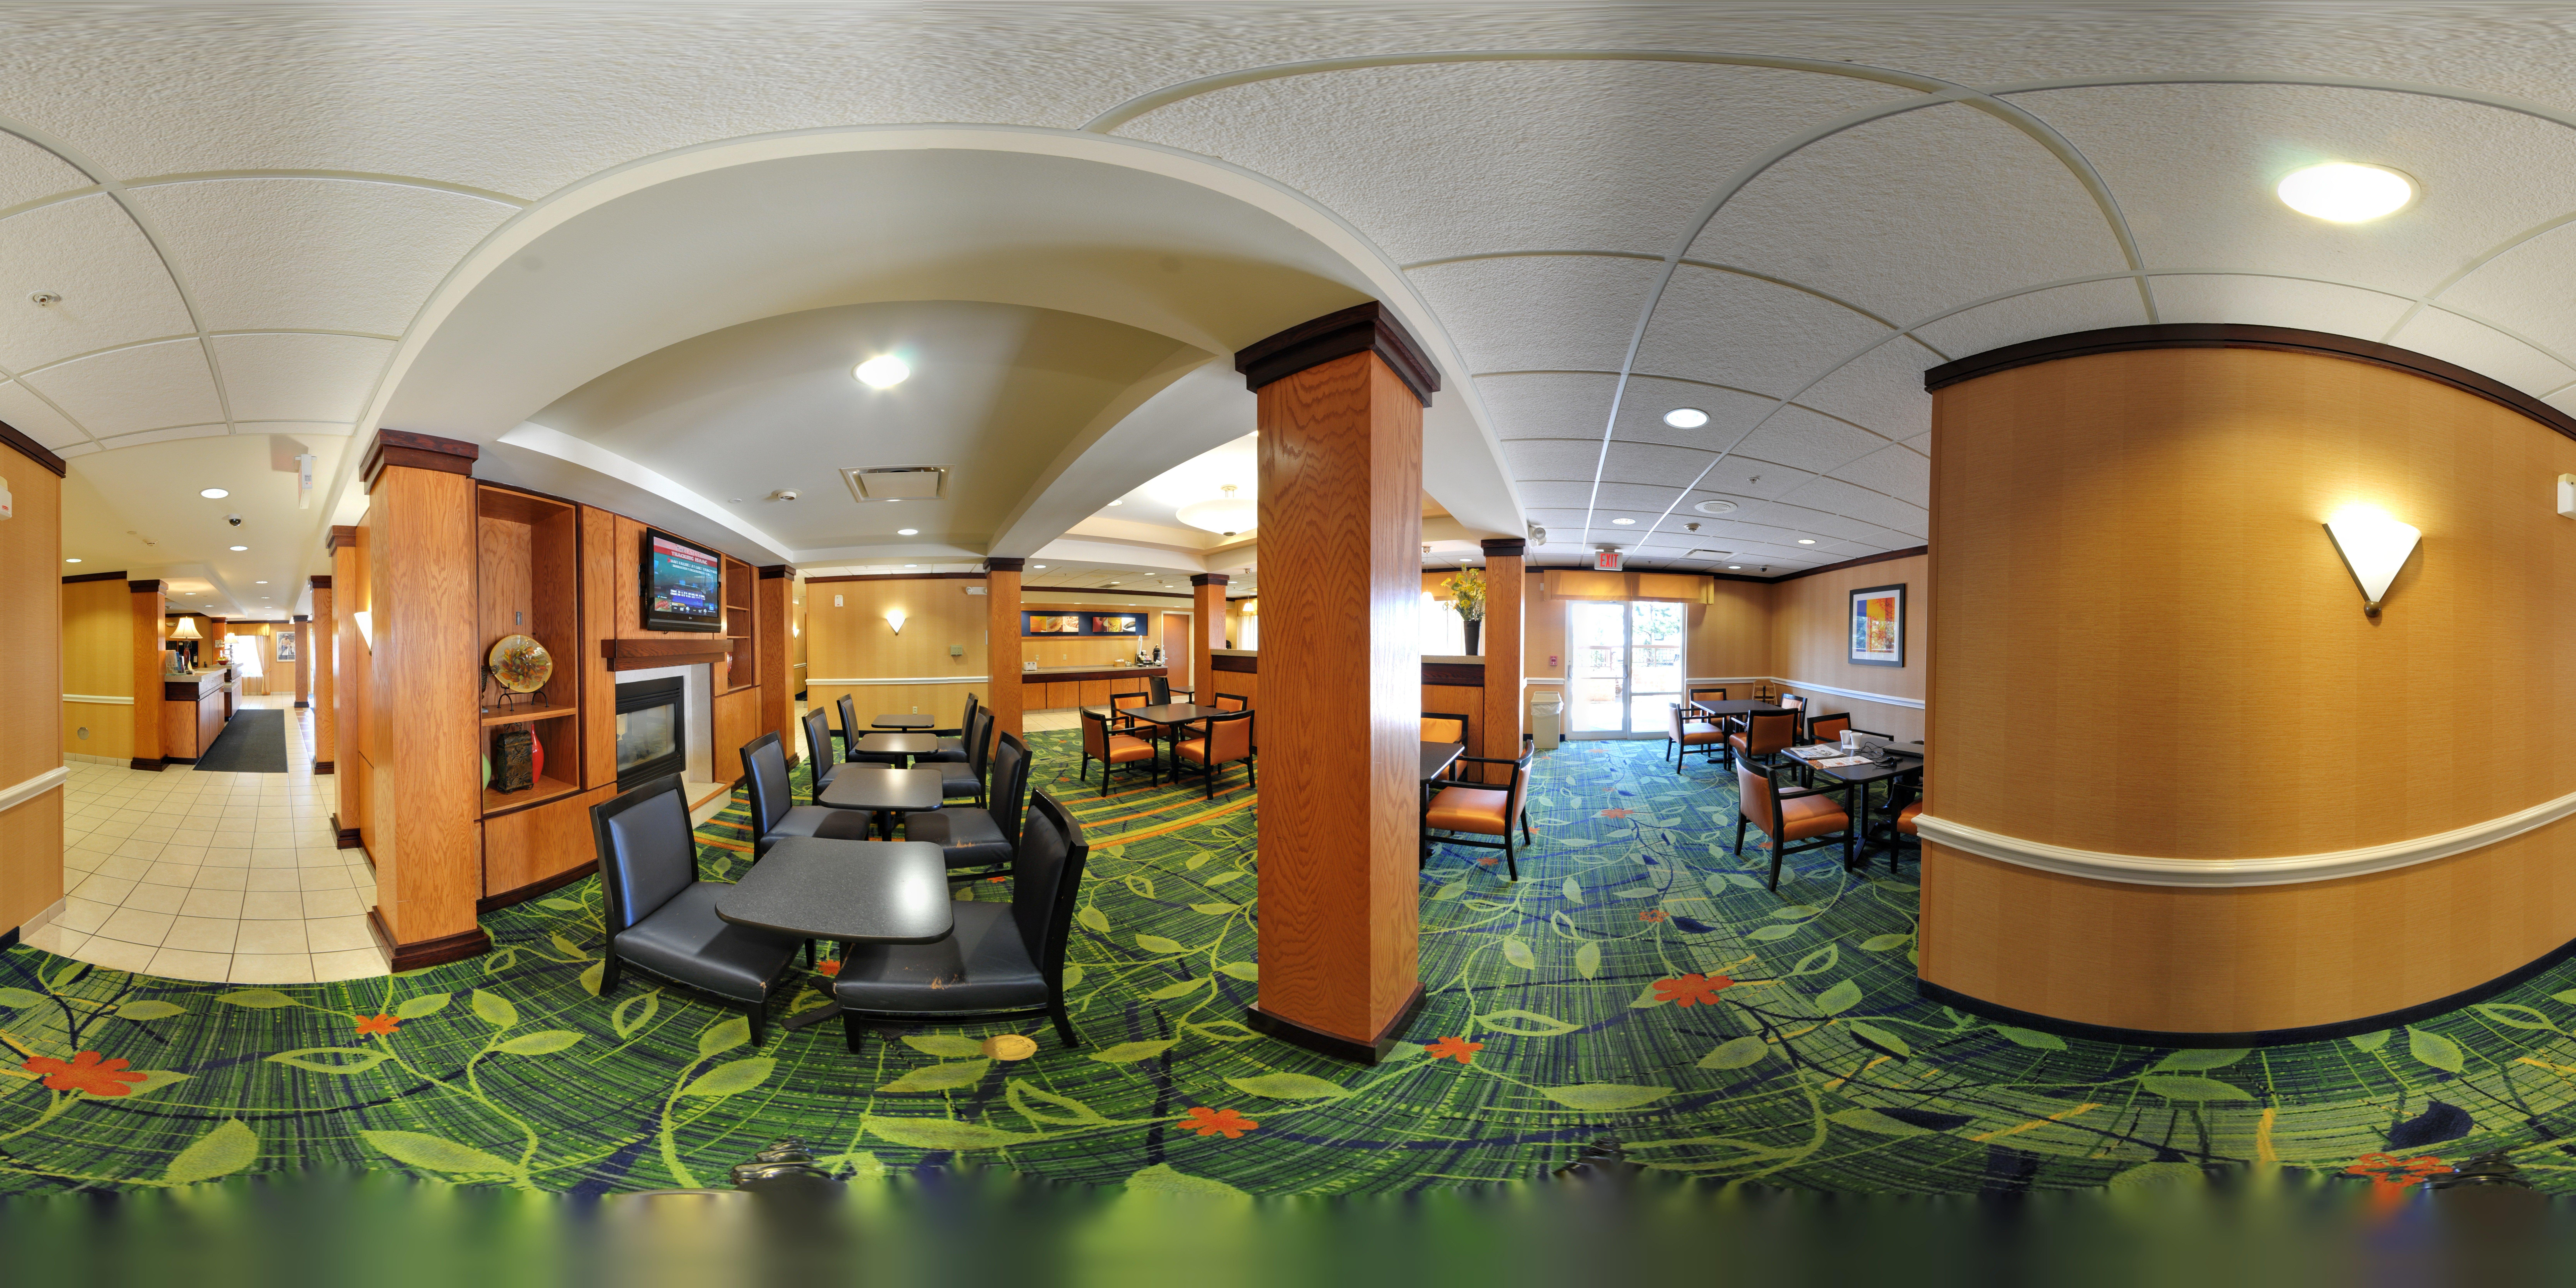 Fairfield Inn & Suites by Marriott Akron South image 35